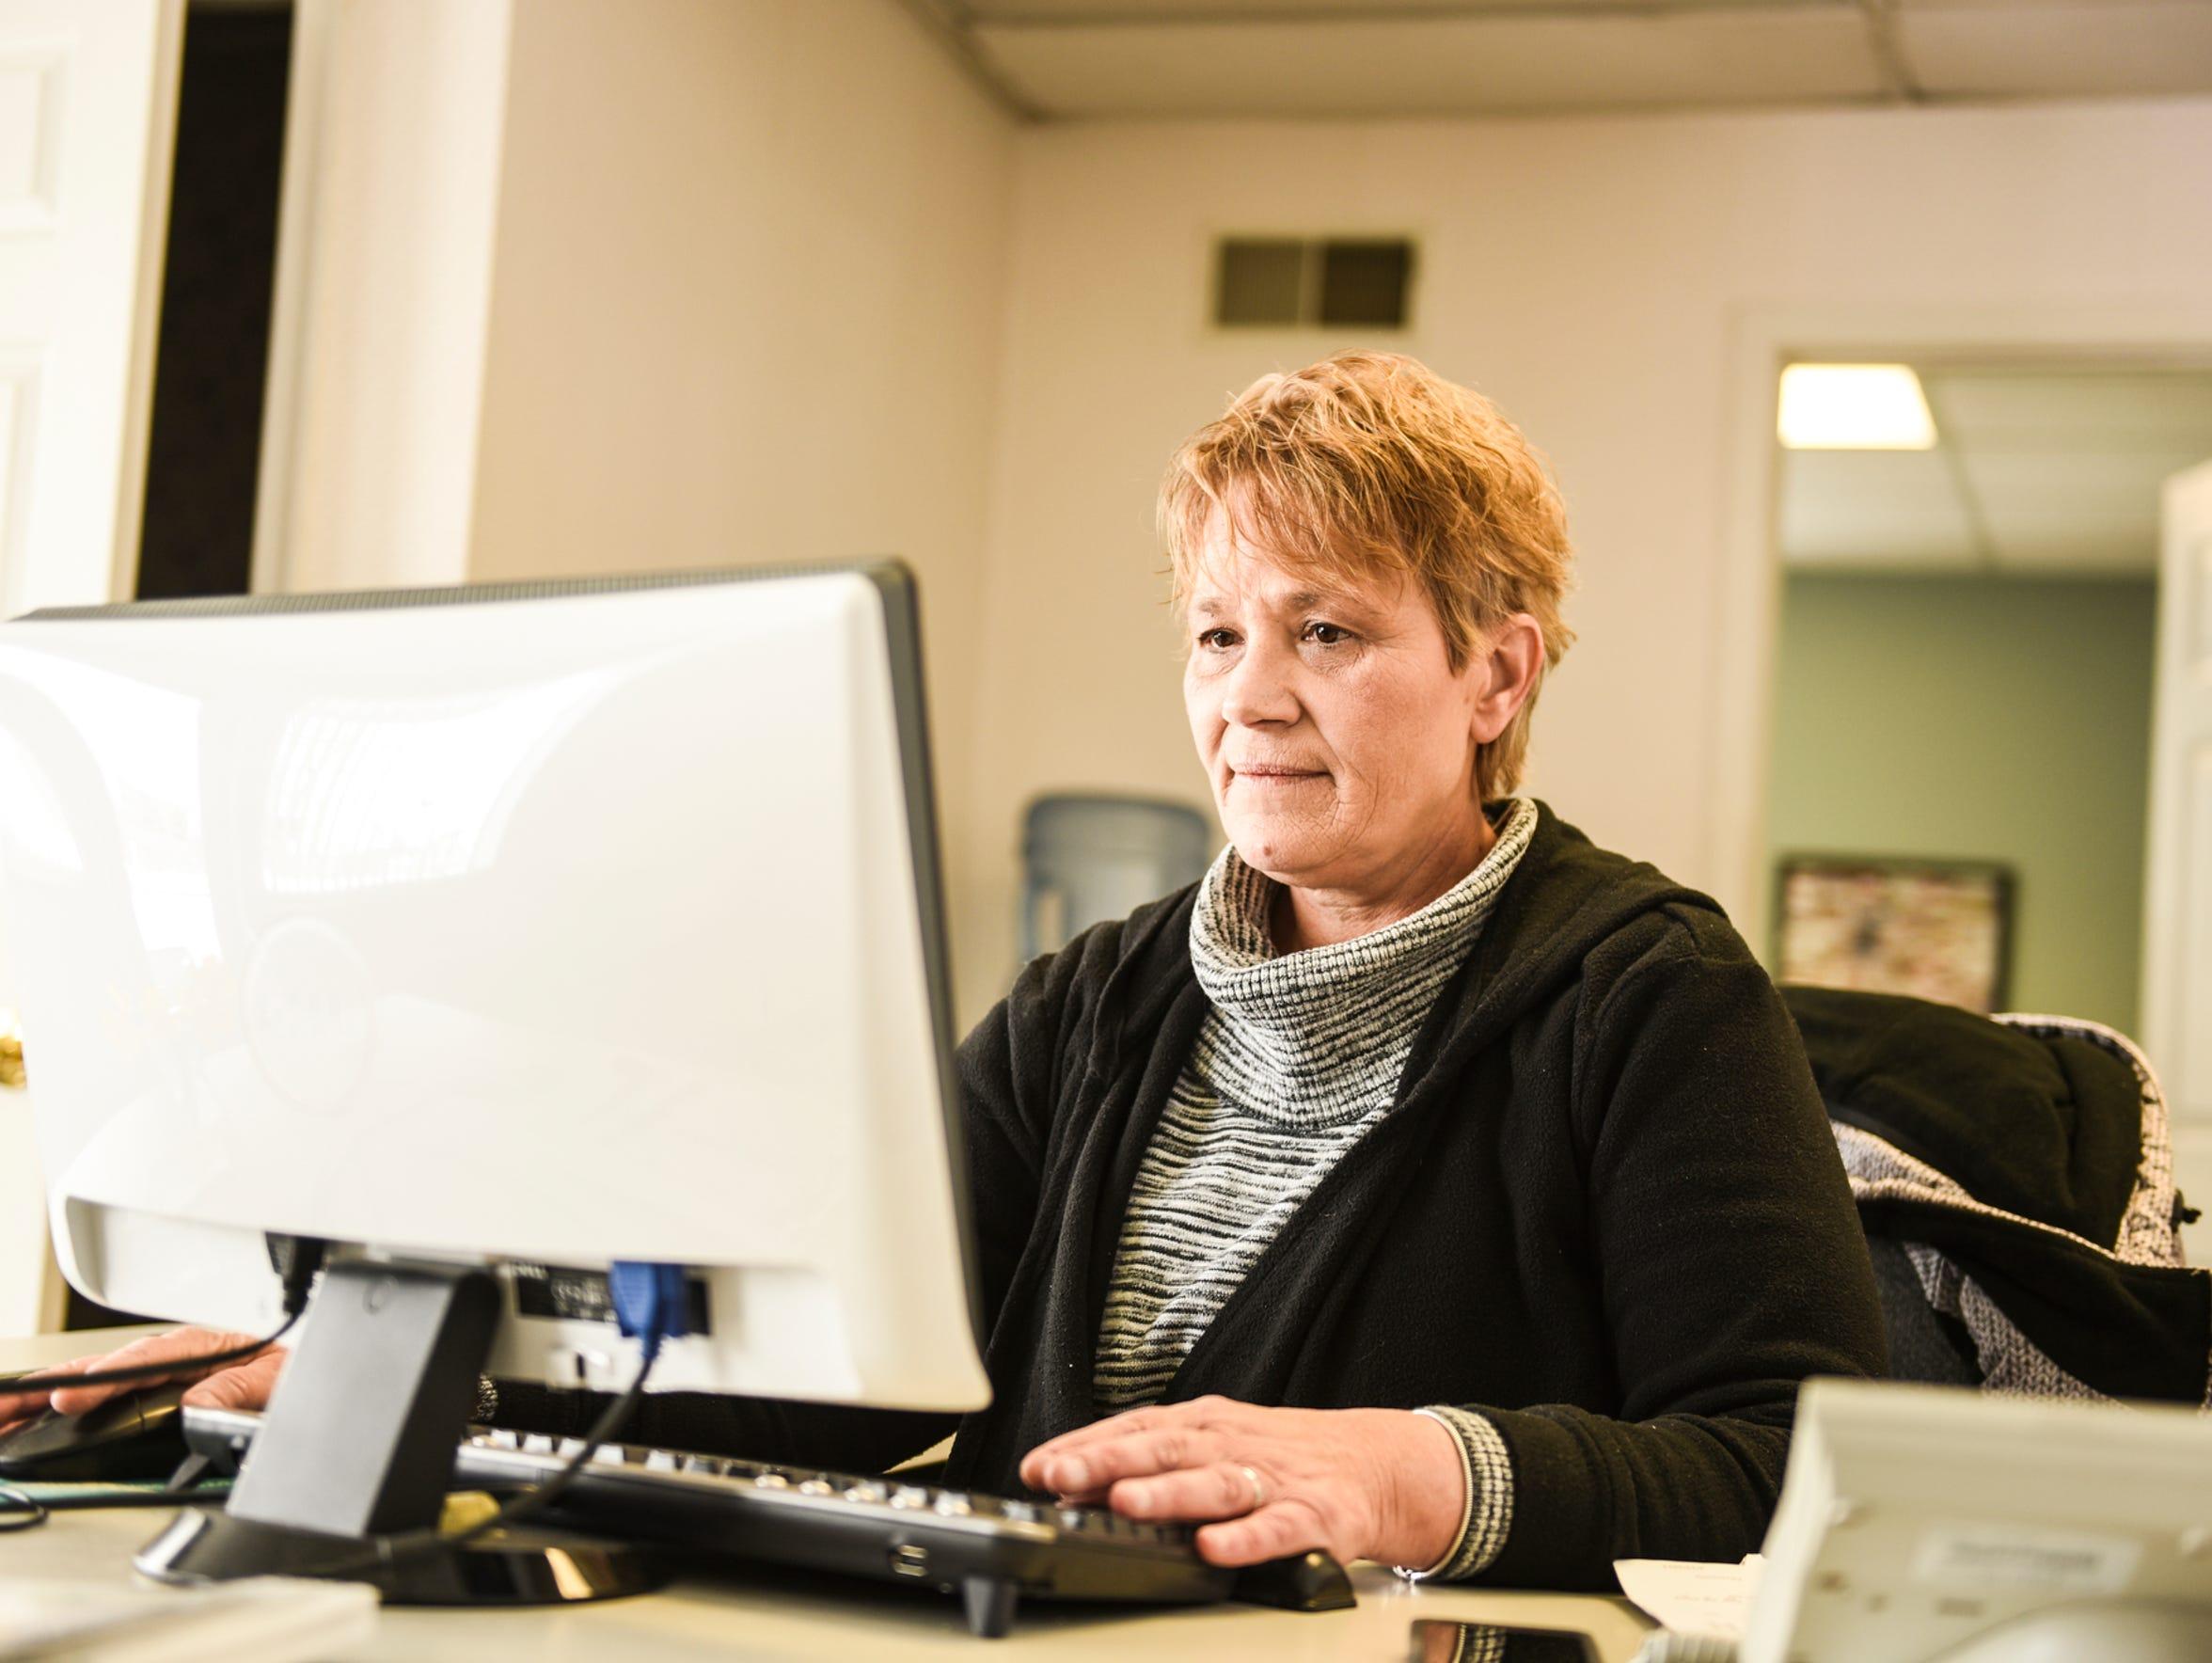 Wendy Keller hasn't been satisfied with her Marketplace